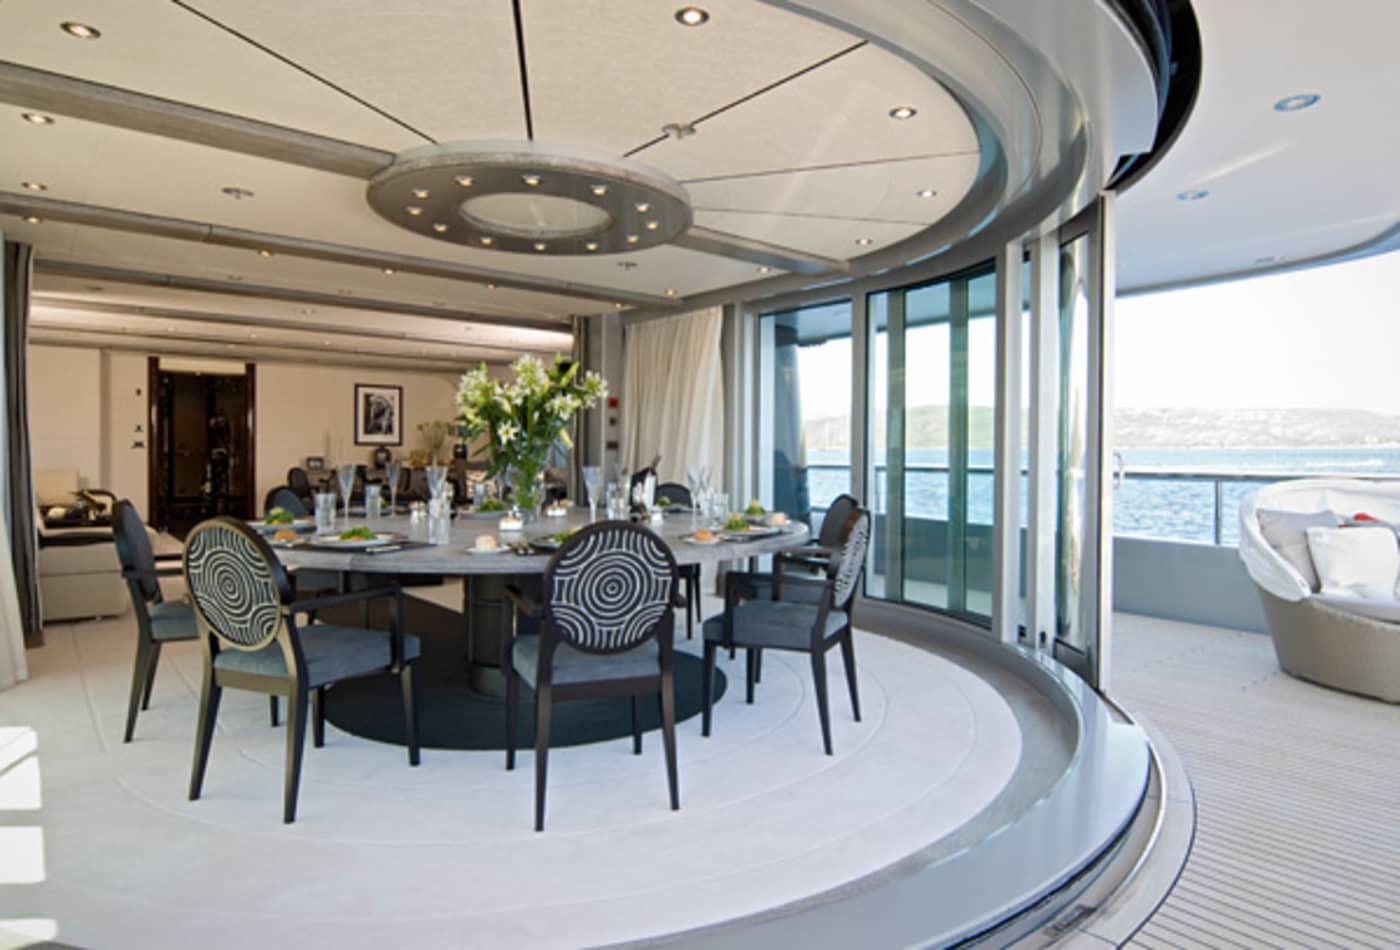 Yachts-at-a-discount-slipstream-interior.jpg